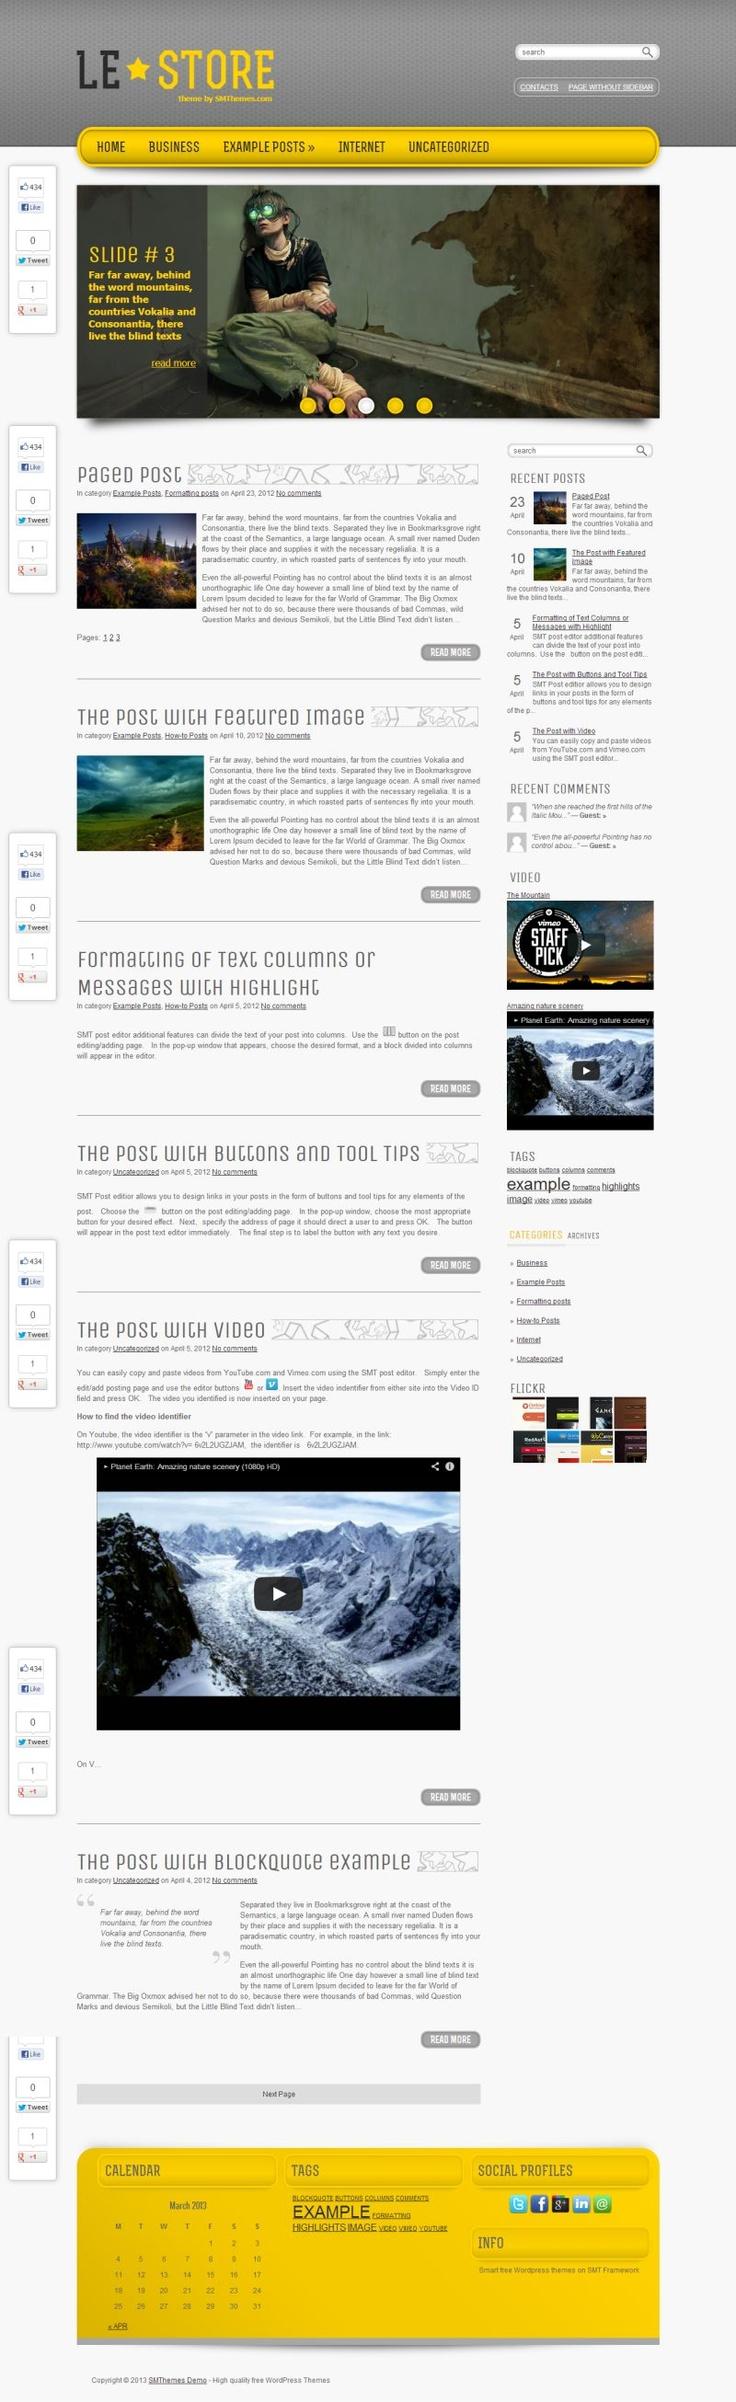 """LeStore"" - #free , stylish &  clean Hi-Tech theme for #WordPress #blog."